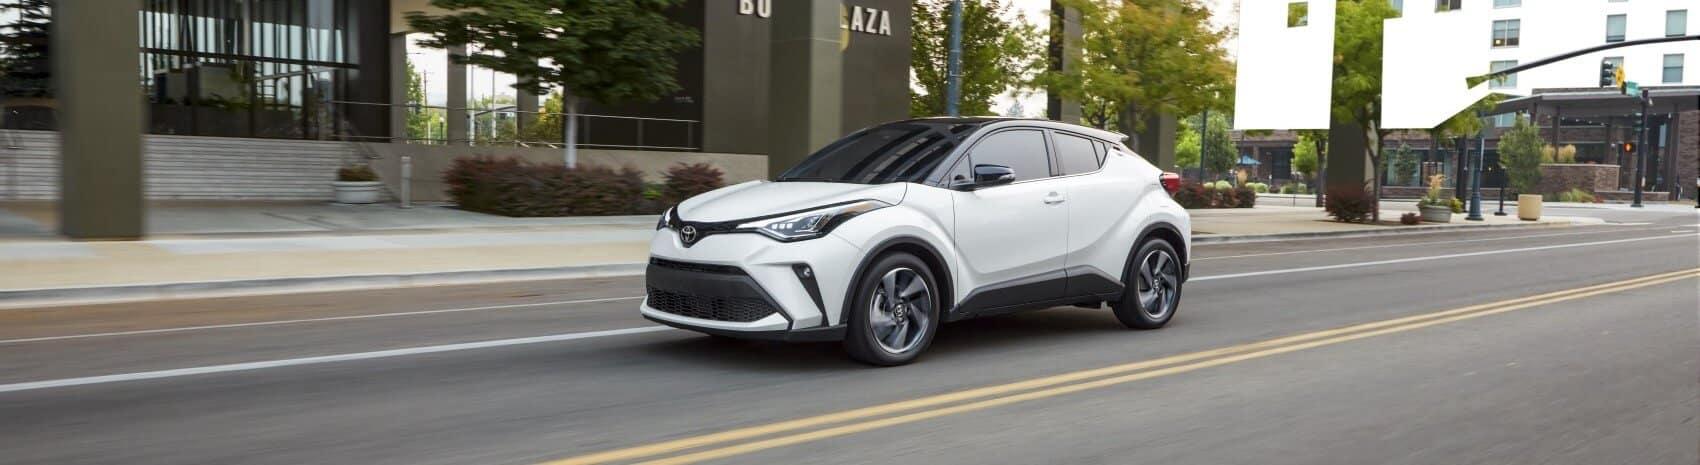 Toyota SUVs C-HR